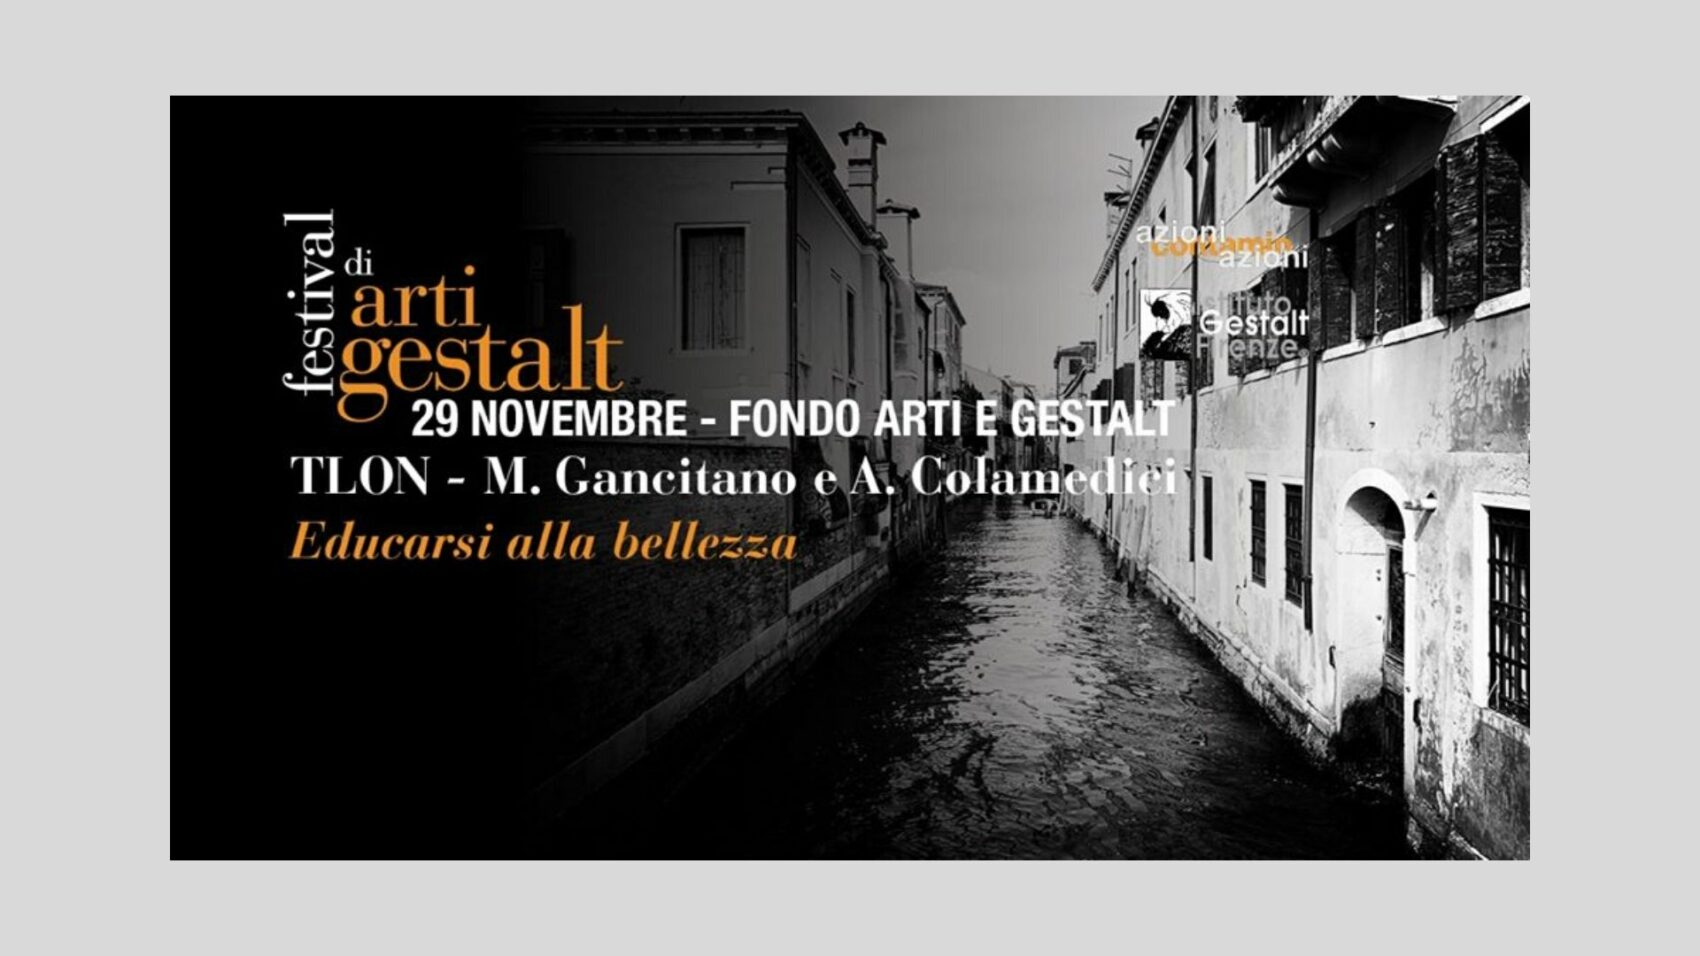 Festival di Arti e Gestalt | Workshop Educarsi alla bellezza [Firenze]